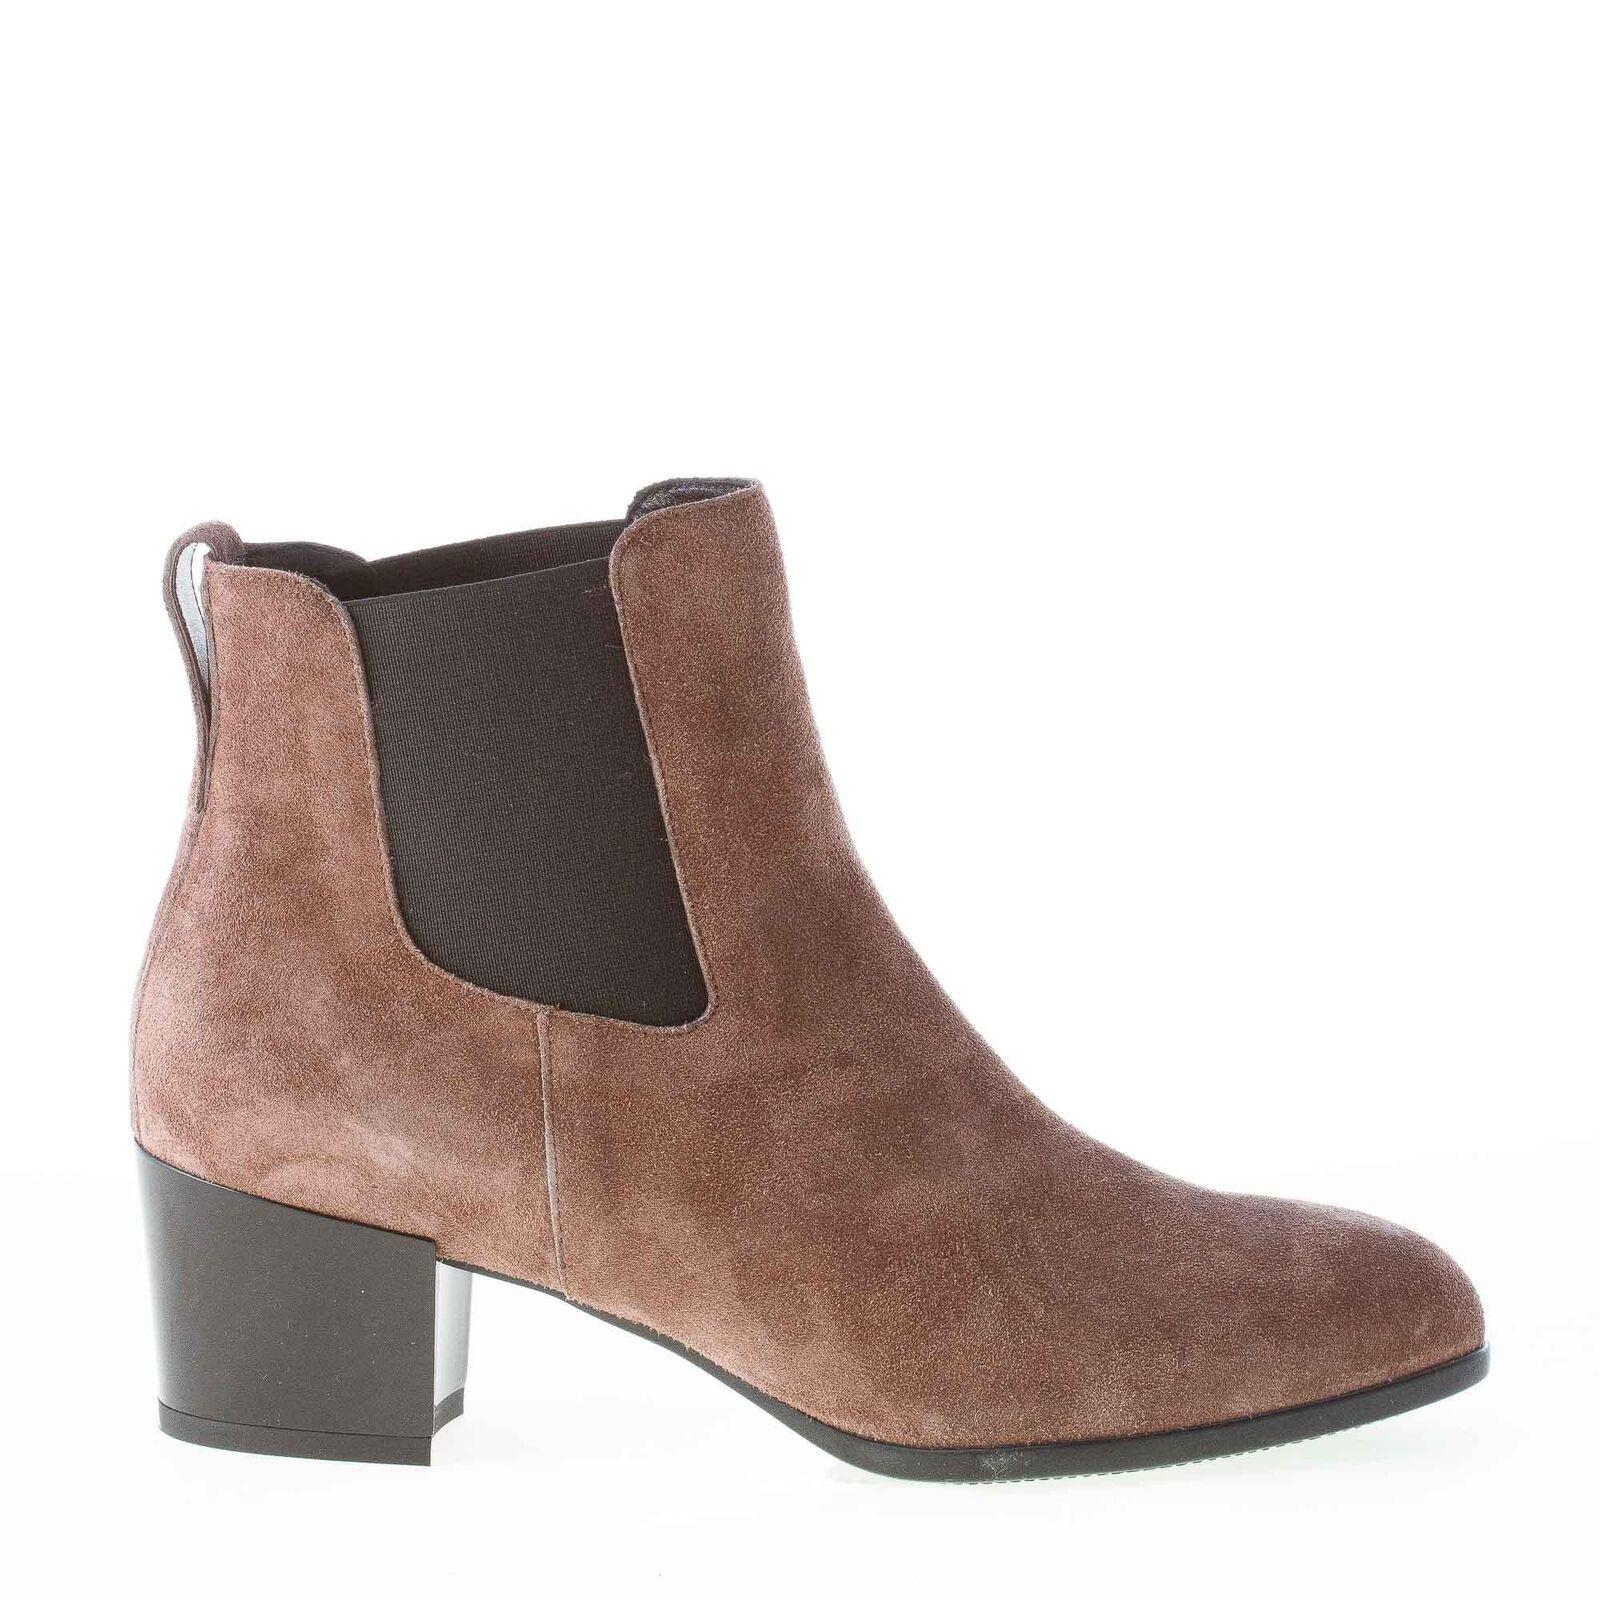 HOGAN damen schuhe schuhe Braun suede H272 almond toe elasticized ankle boot